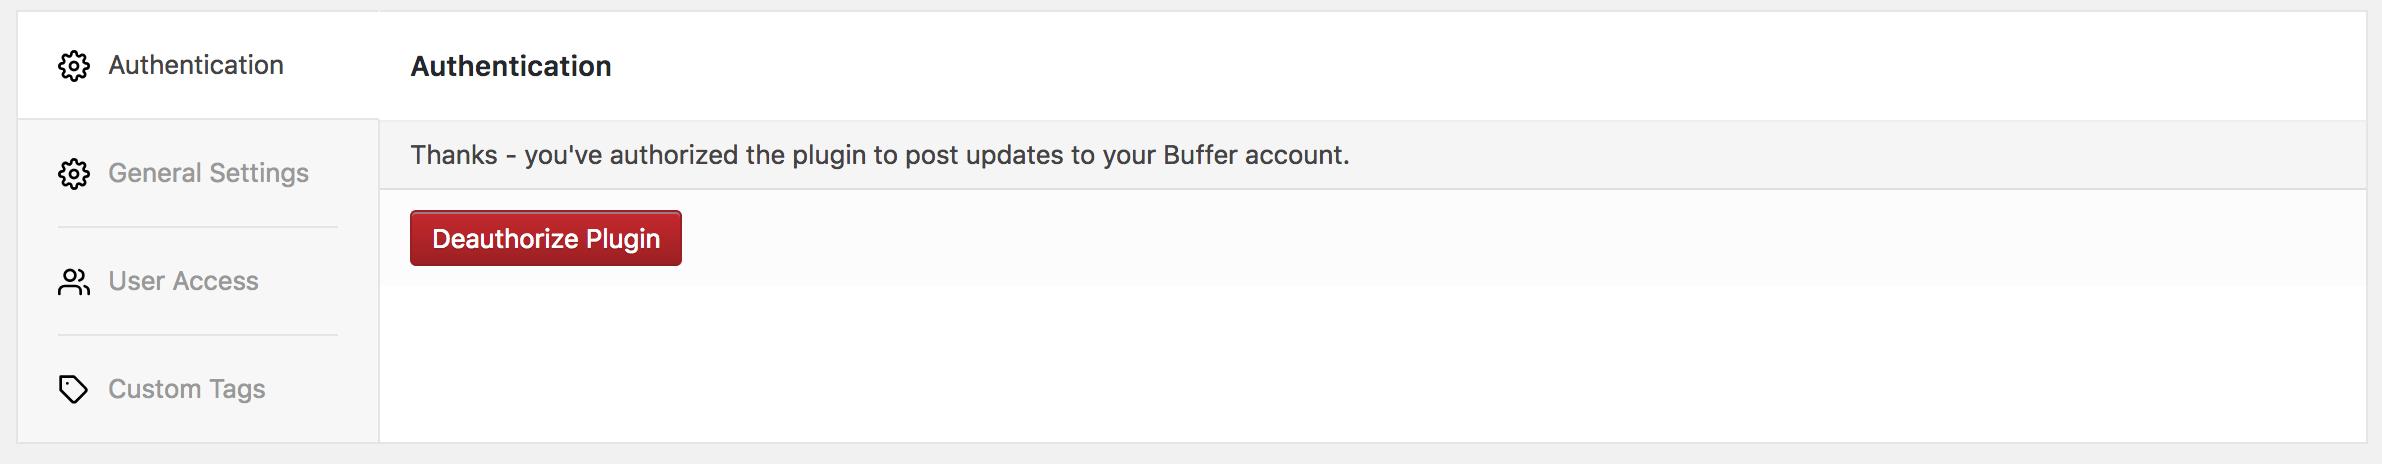 WordPress to Buffer Pro: Settings: Authentication Screen